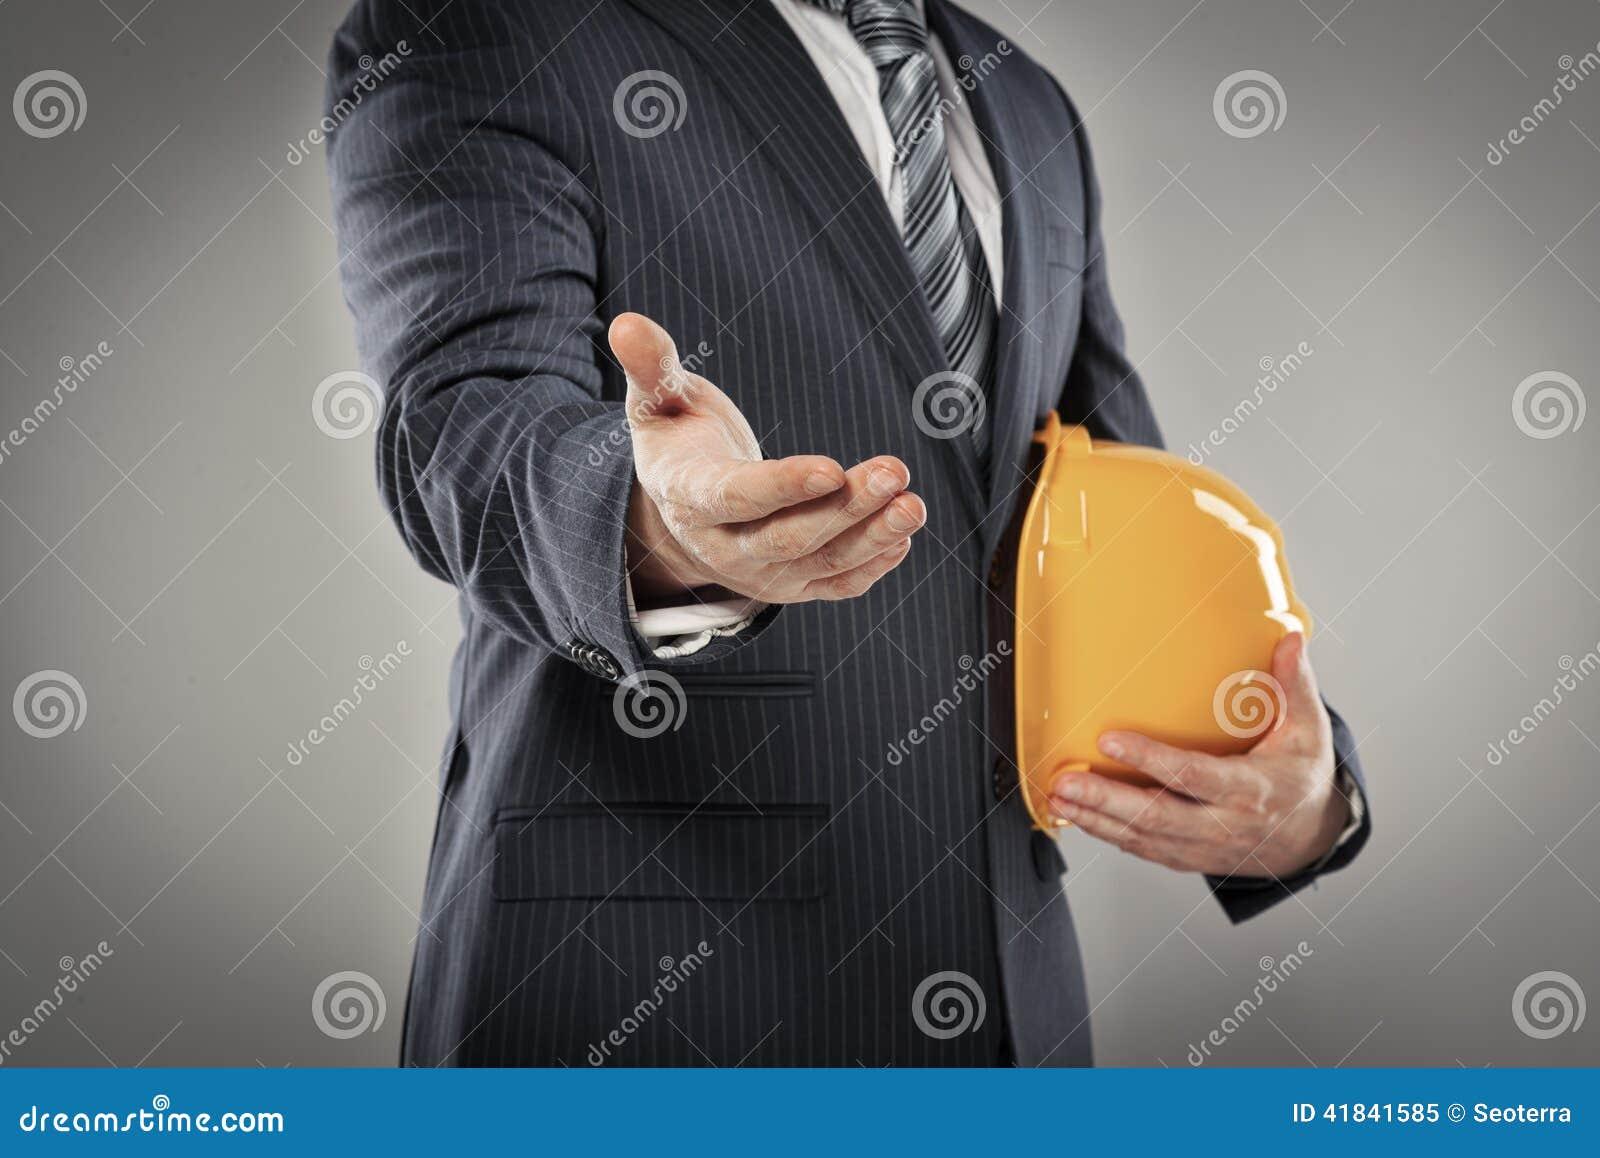 Coordenador masculino